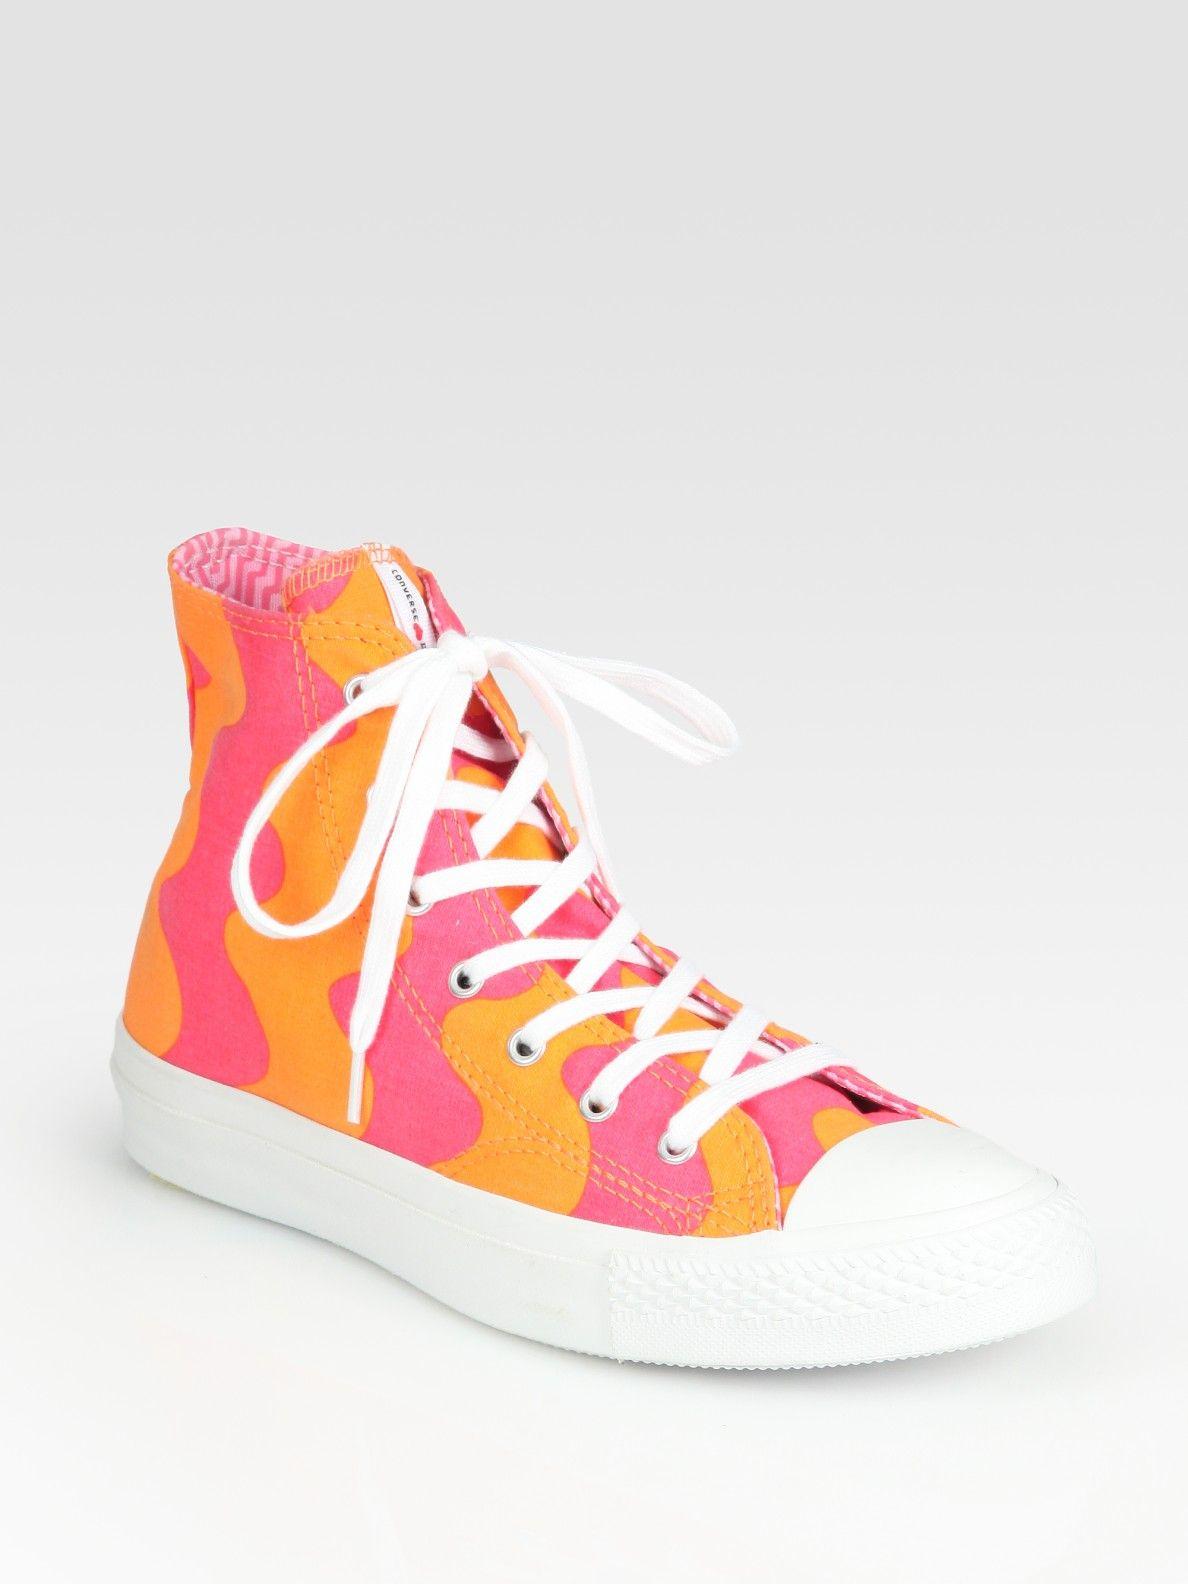 22547c2becbf Converse Chuck Taylor All Star High Top Marimekko Sneakers in Orange (pink)